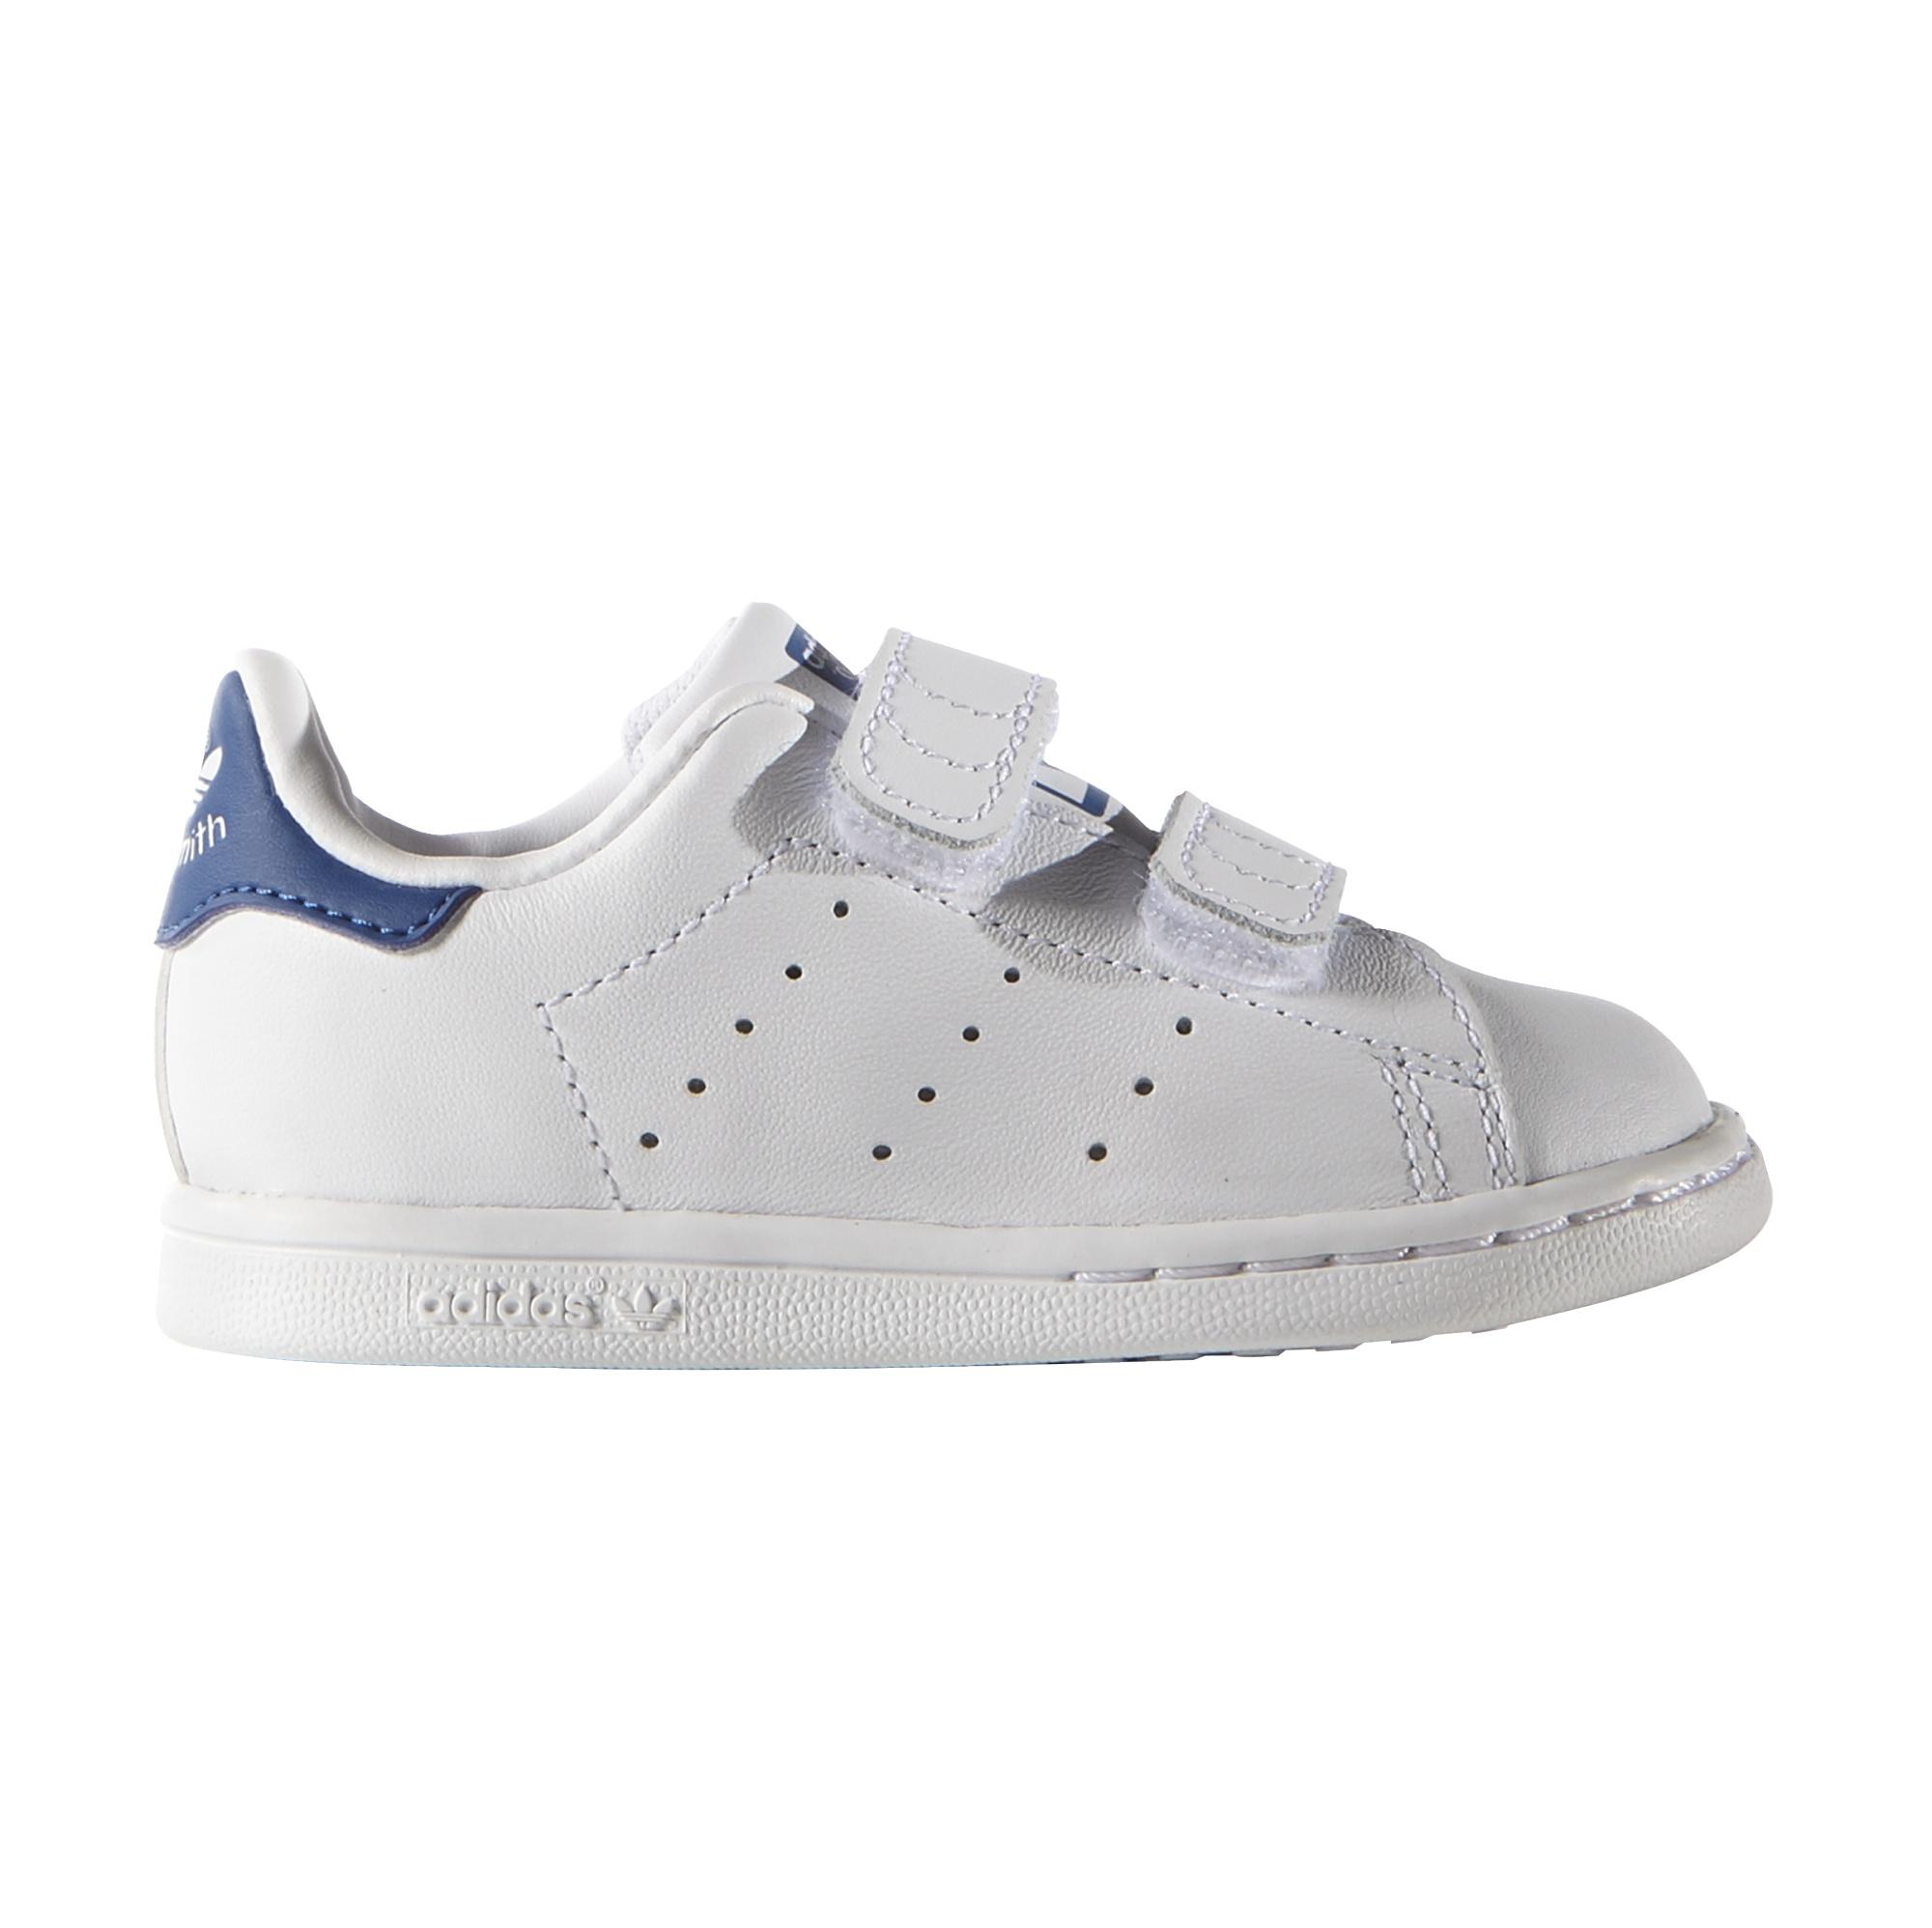 100% authentic 58fcd a6799 Adidas Originals Stan Smith CF I (blanco azul)